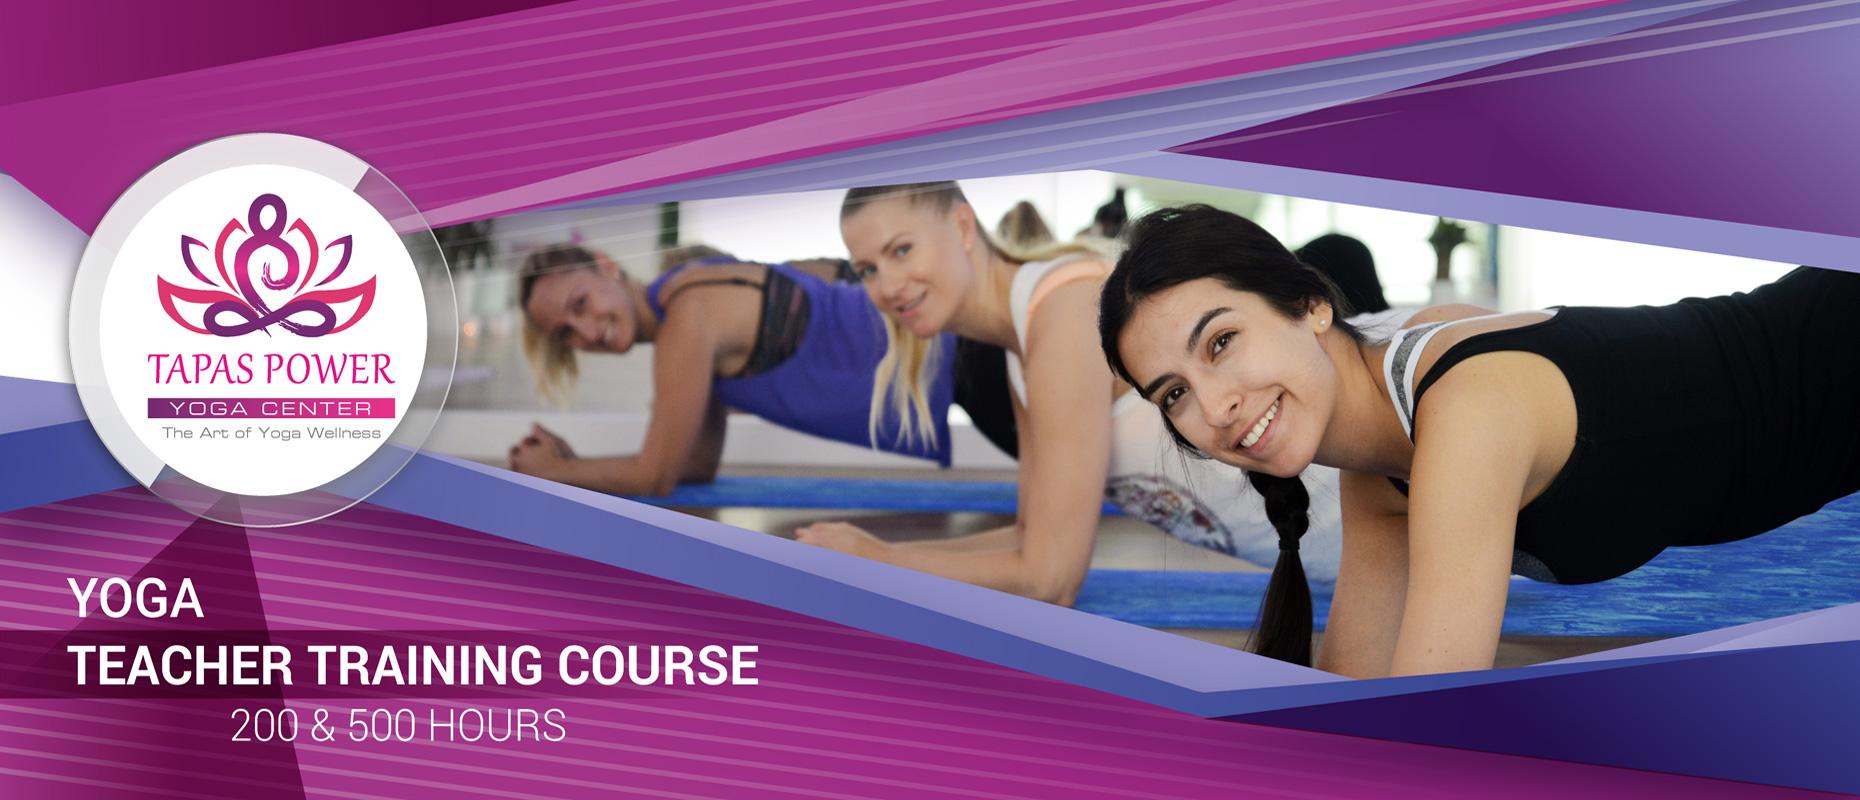 500 hours yoga teacher training course